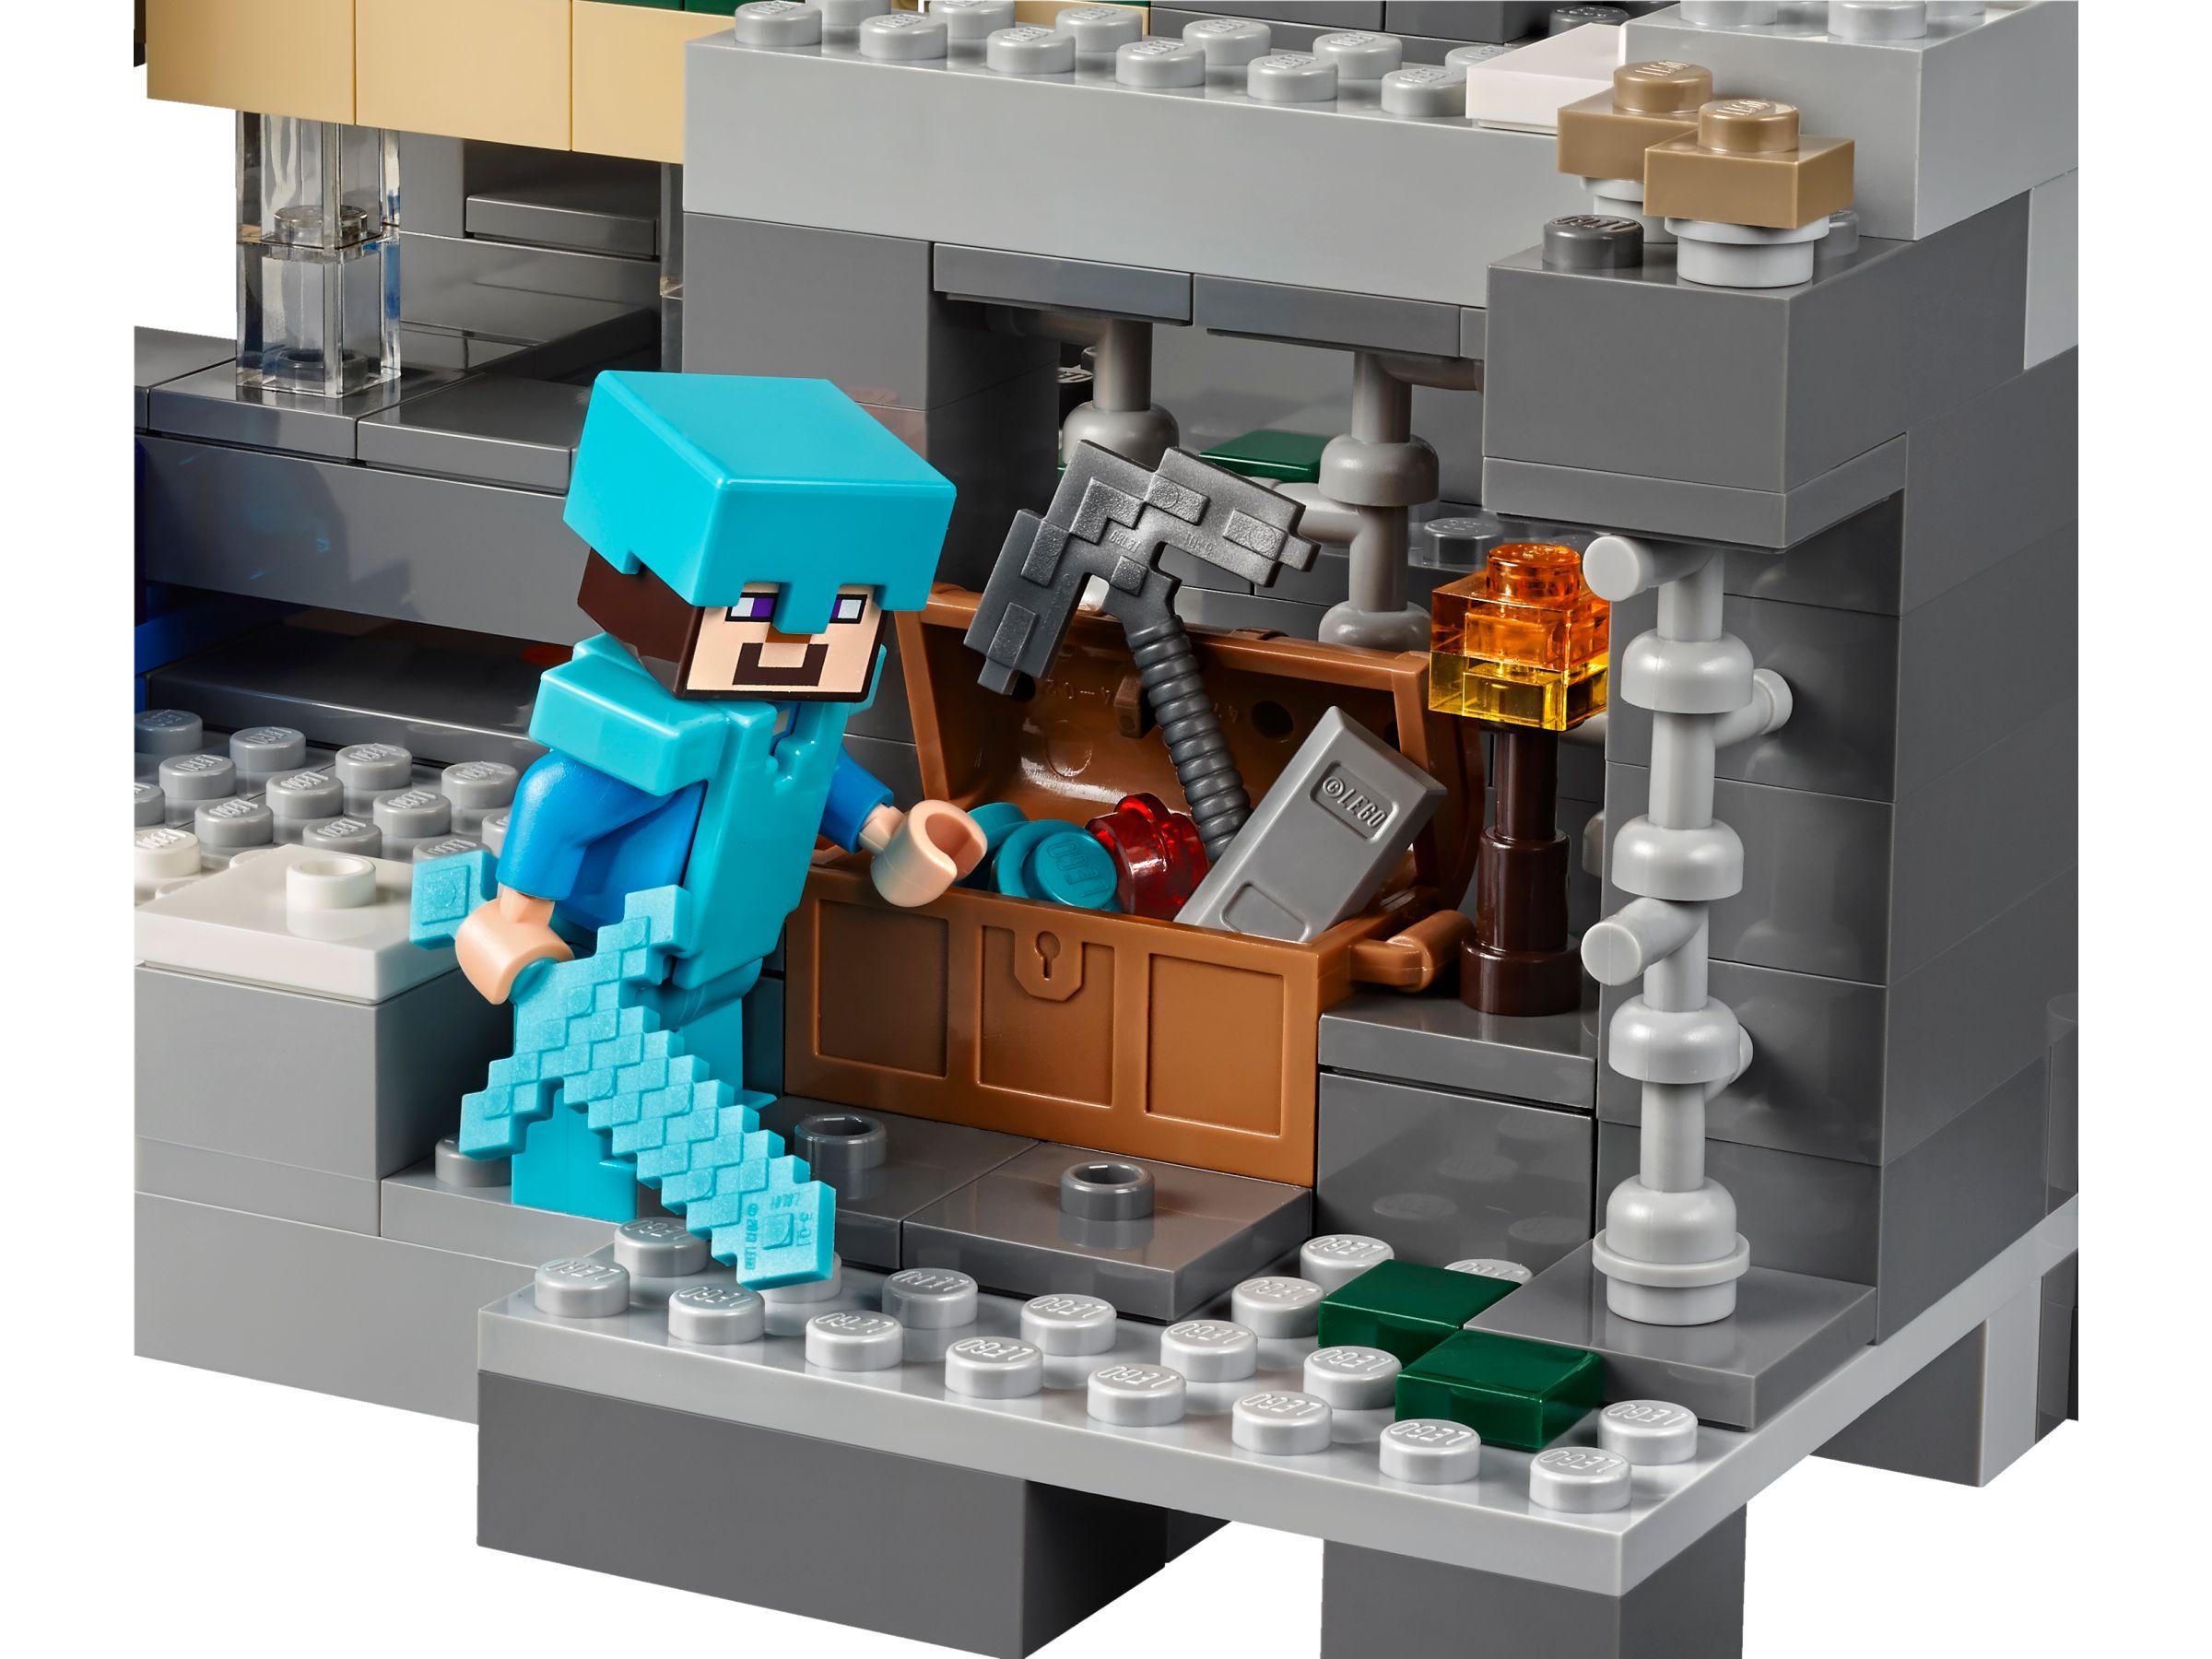 Лего музыка майнкрафт